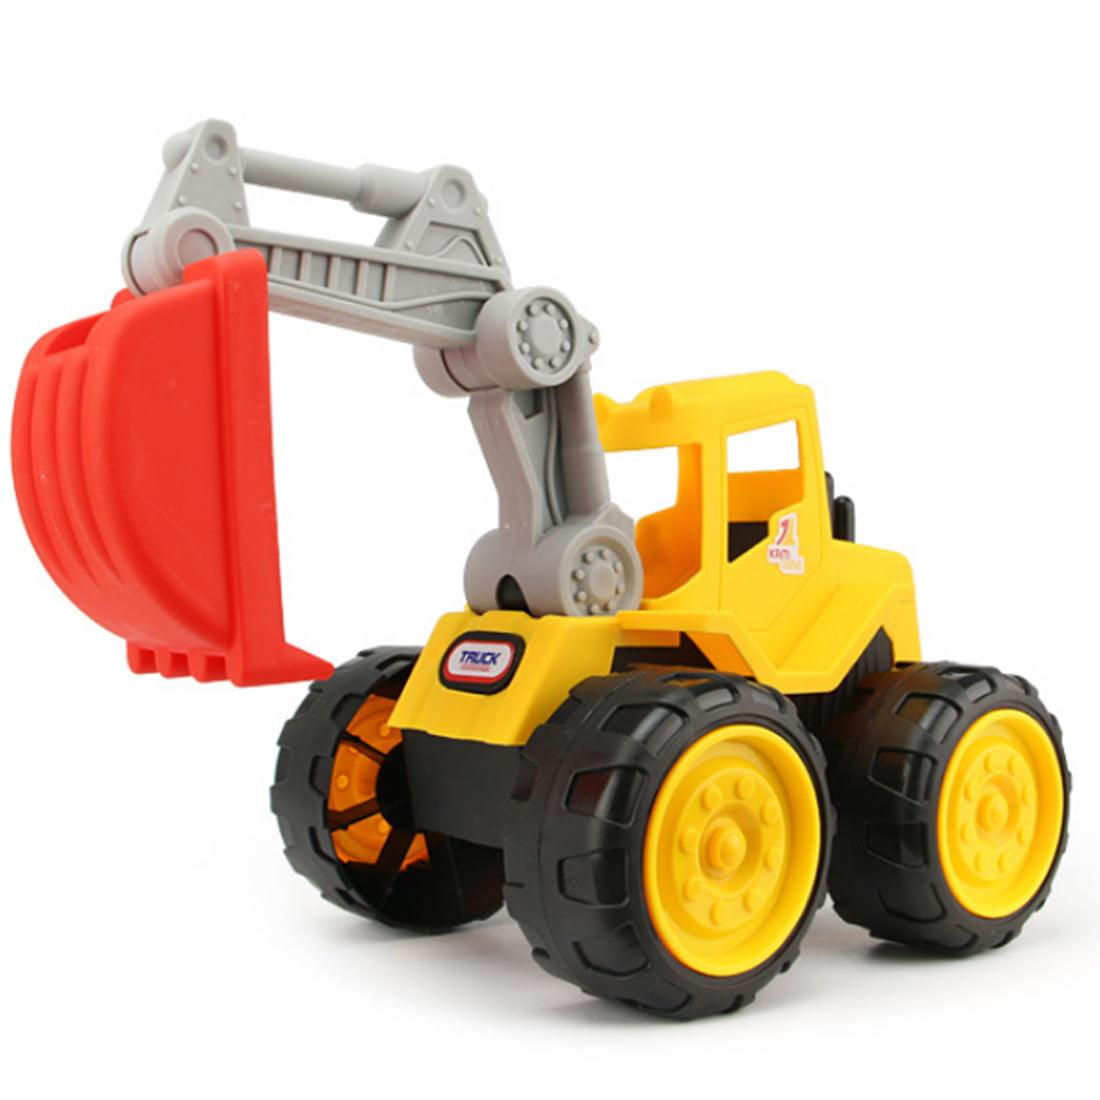 Kids Beach Sand Excavator Truck Beach Playing Tools Children Large Machineshop Truck Series Simulation Kids Fancy Toys... by